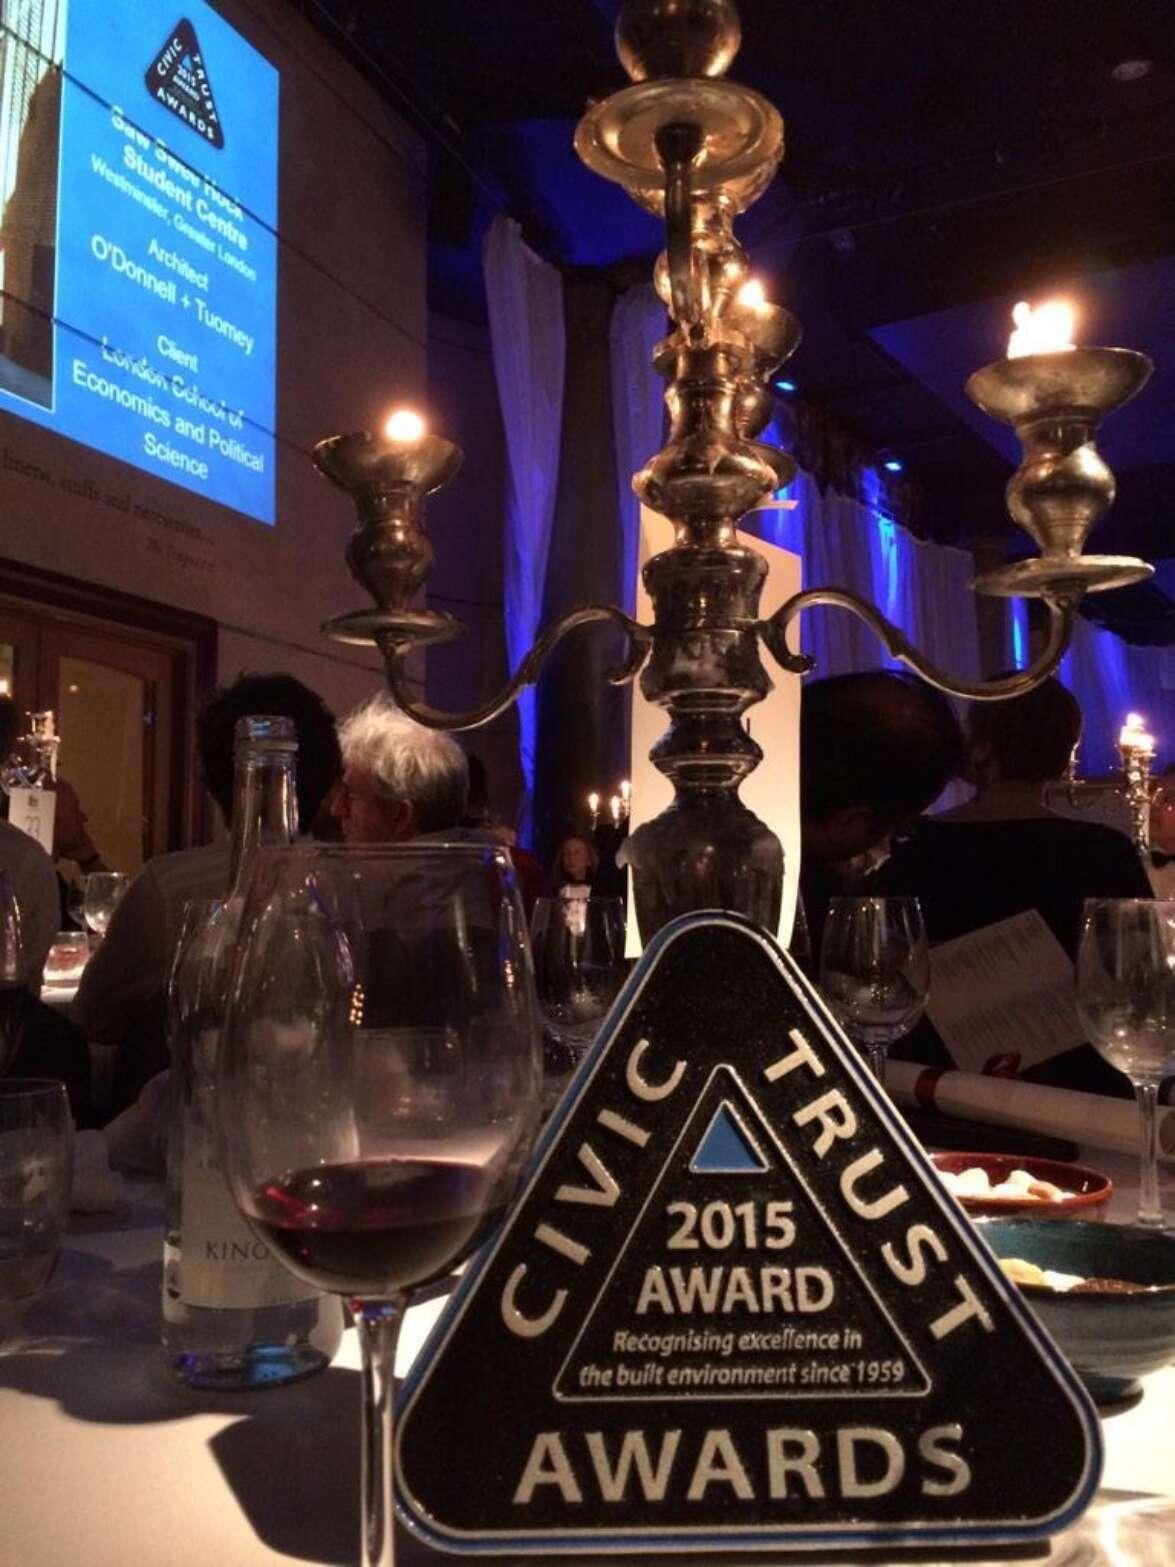 Kings Cross Square scoops Civic Trust Award